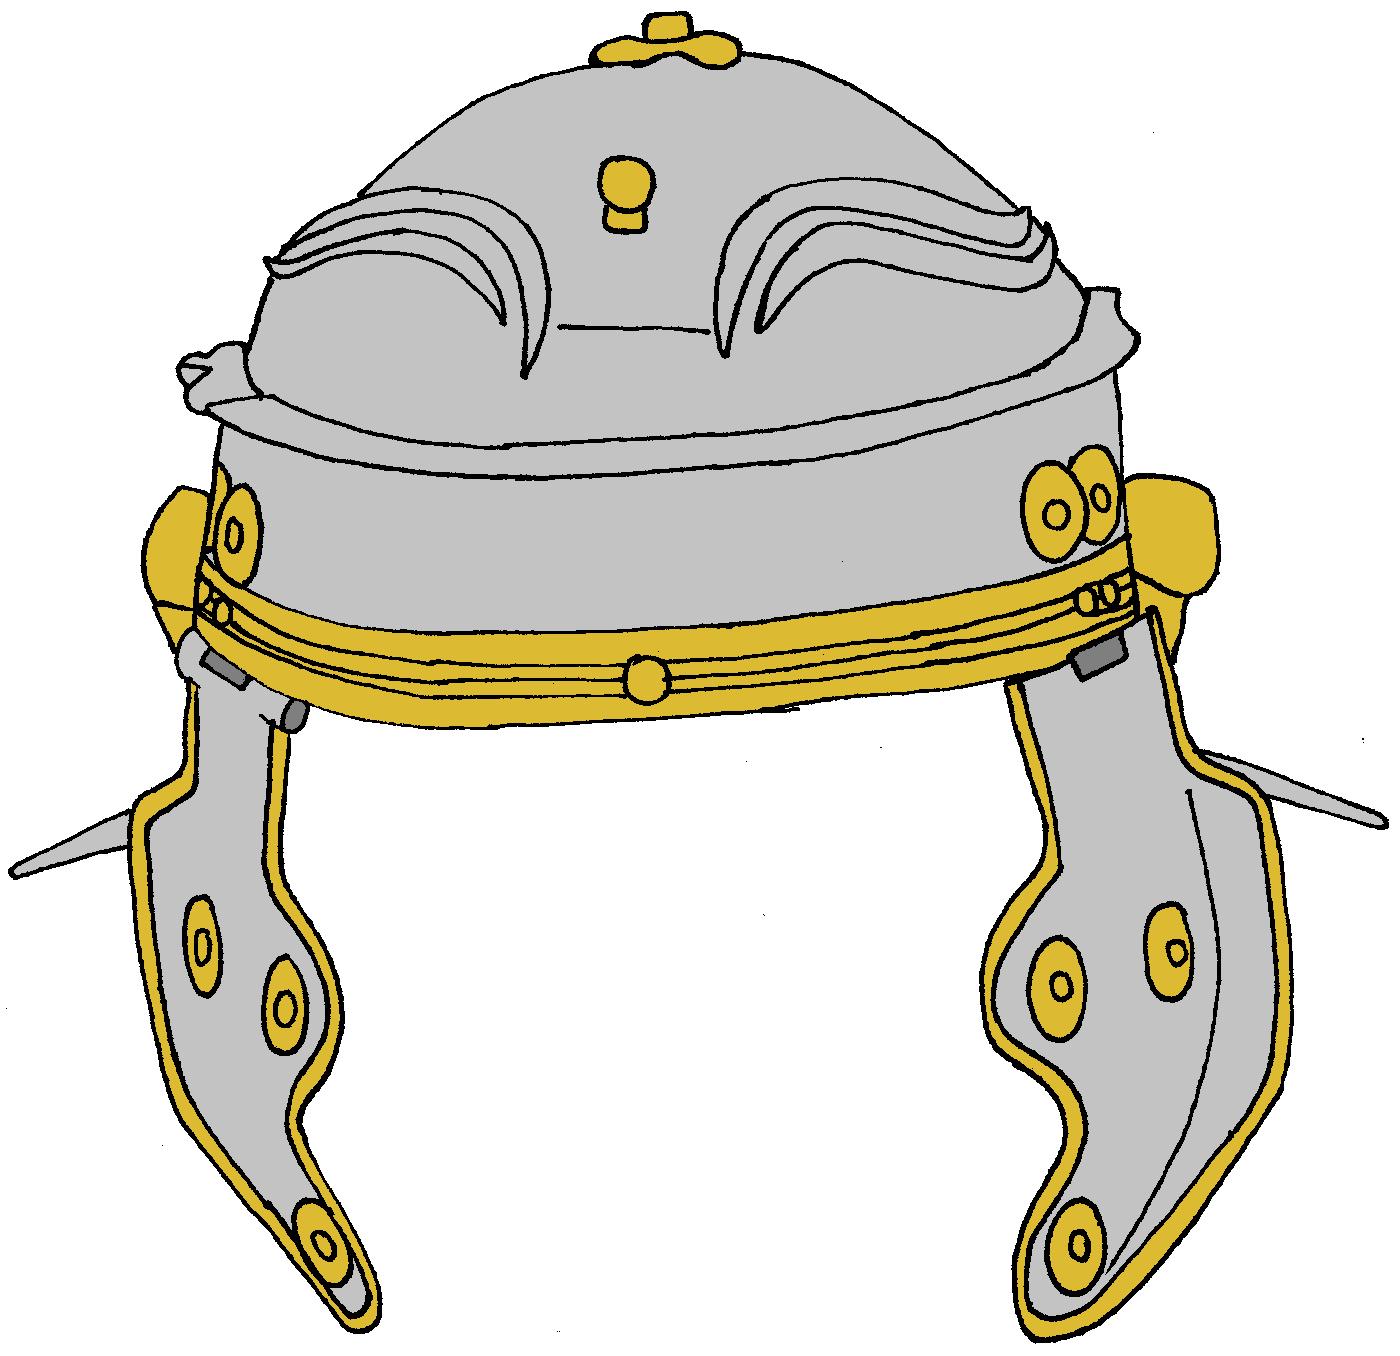 Roman Imperial Gallic C Helmet Roman History Ancient Rome History